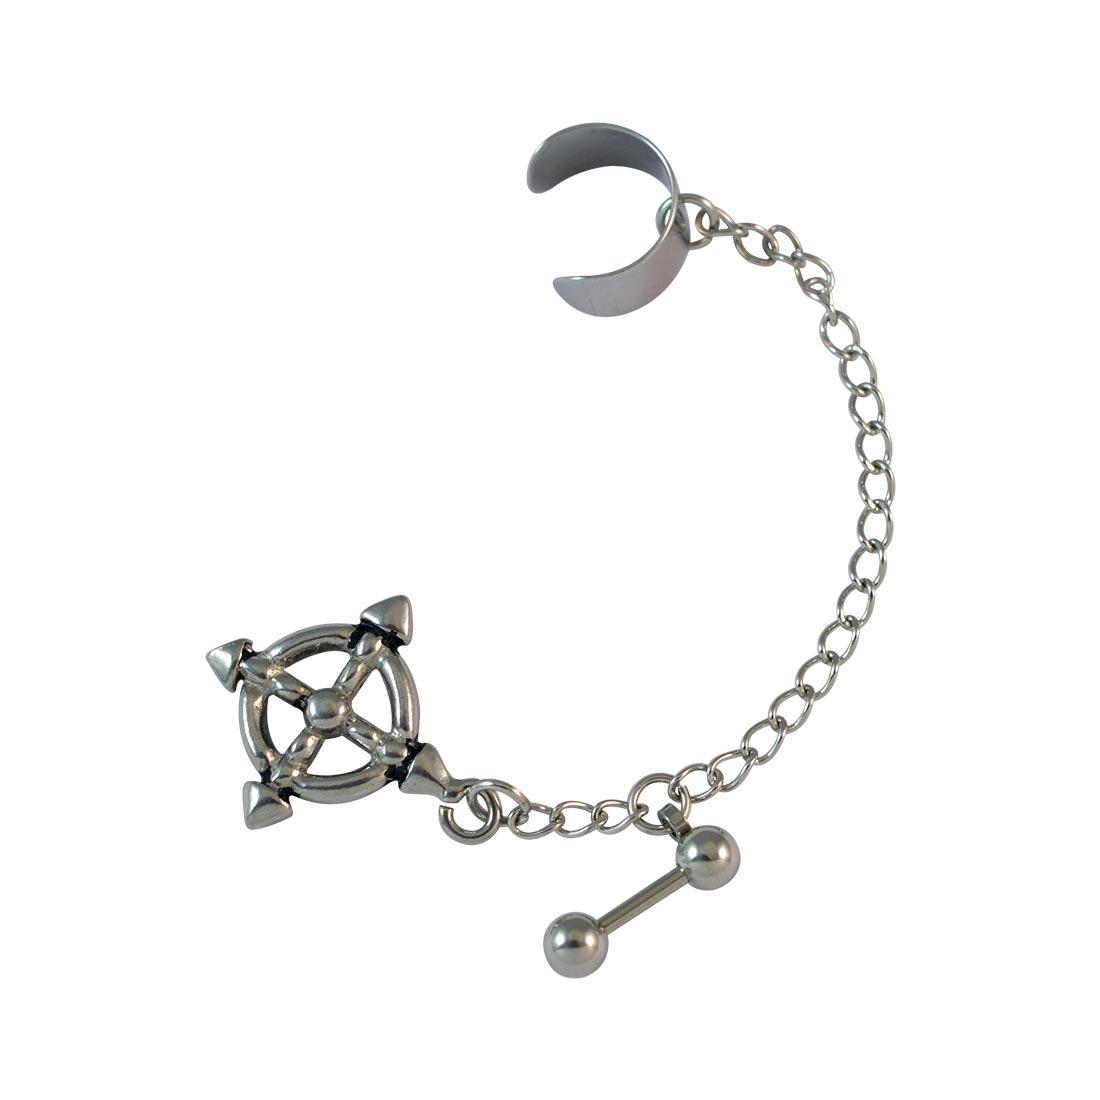 f9b786cd6f6a1 Ship wheel single chain ear cuff for men - silver